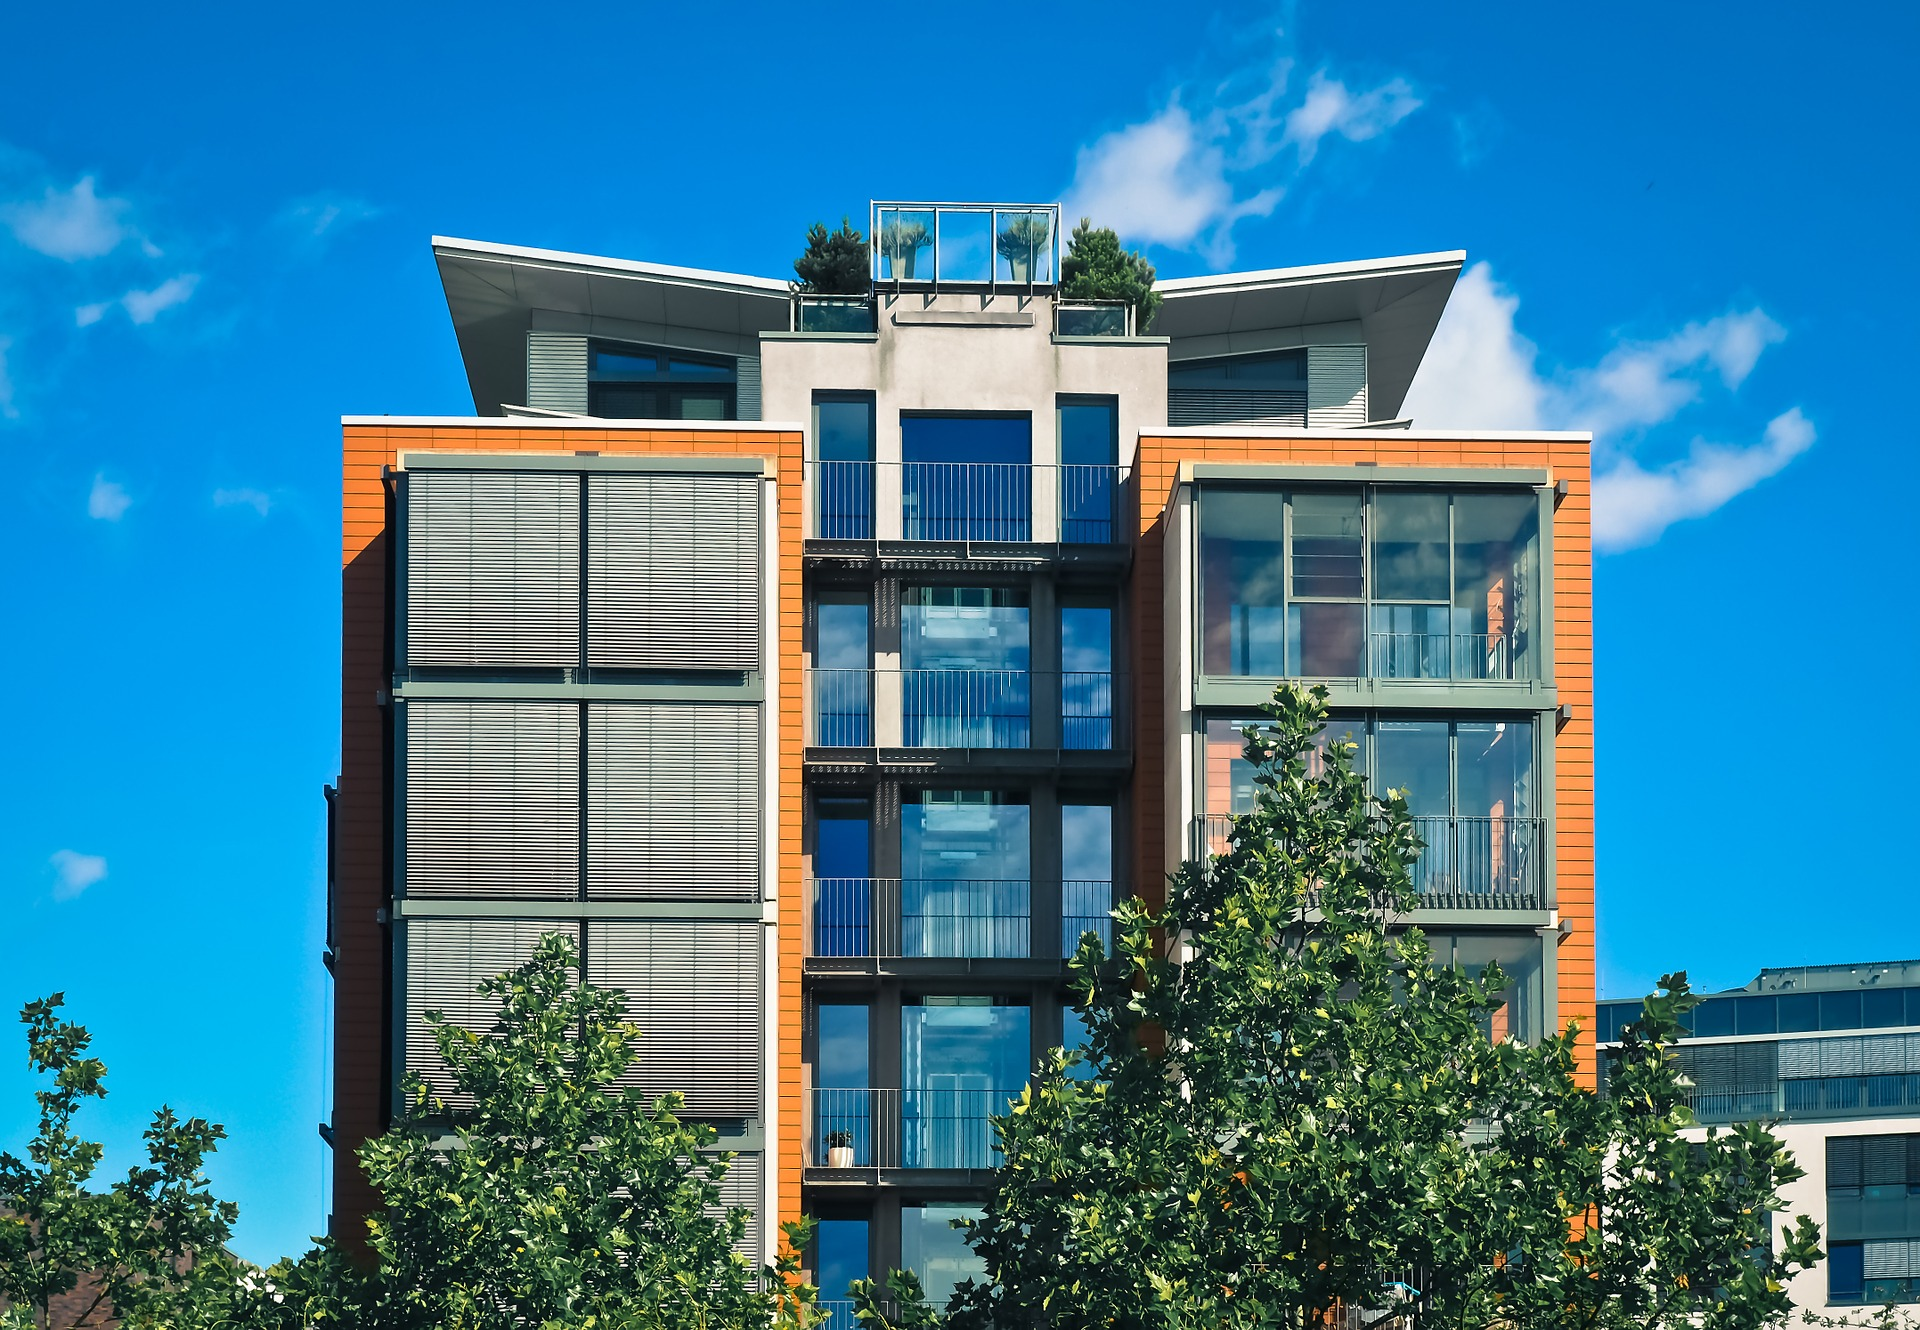 Rendite mit Immobilien